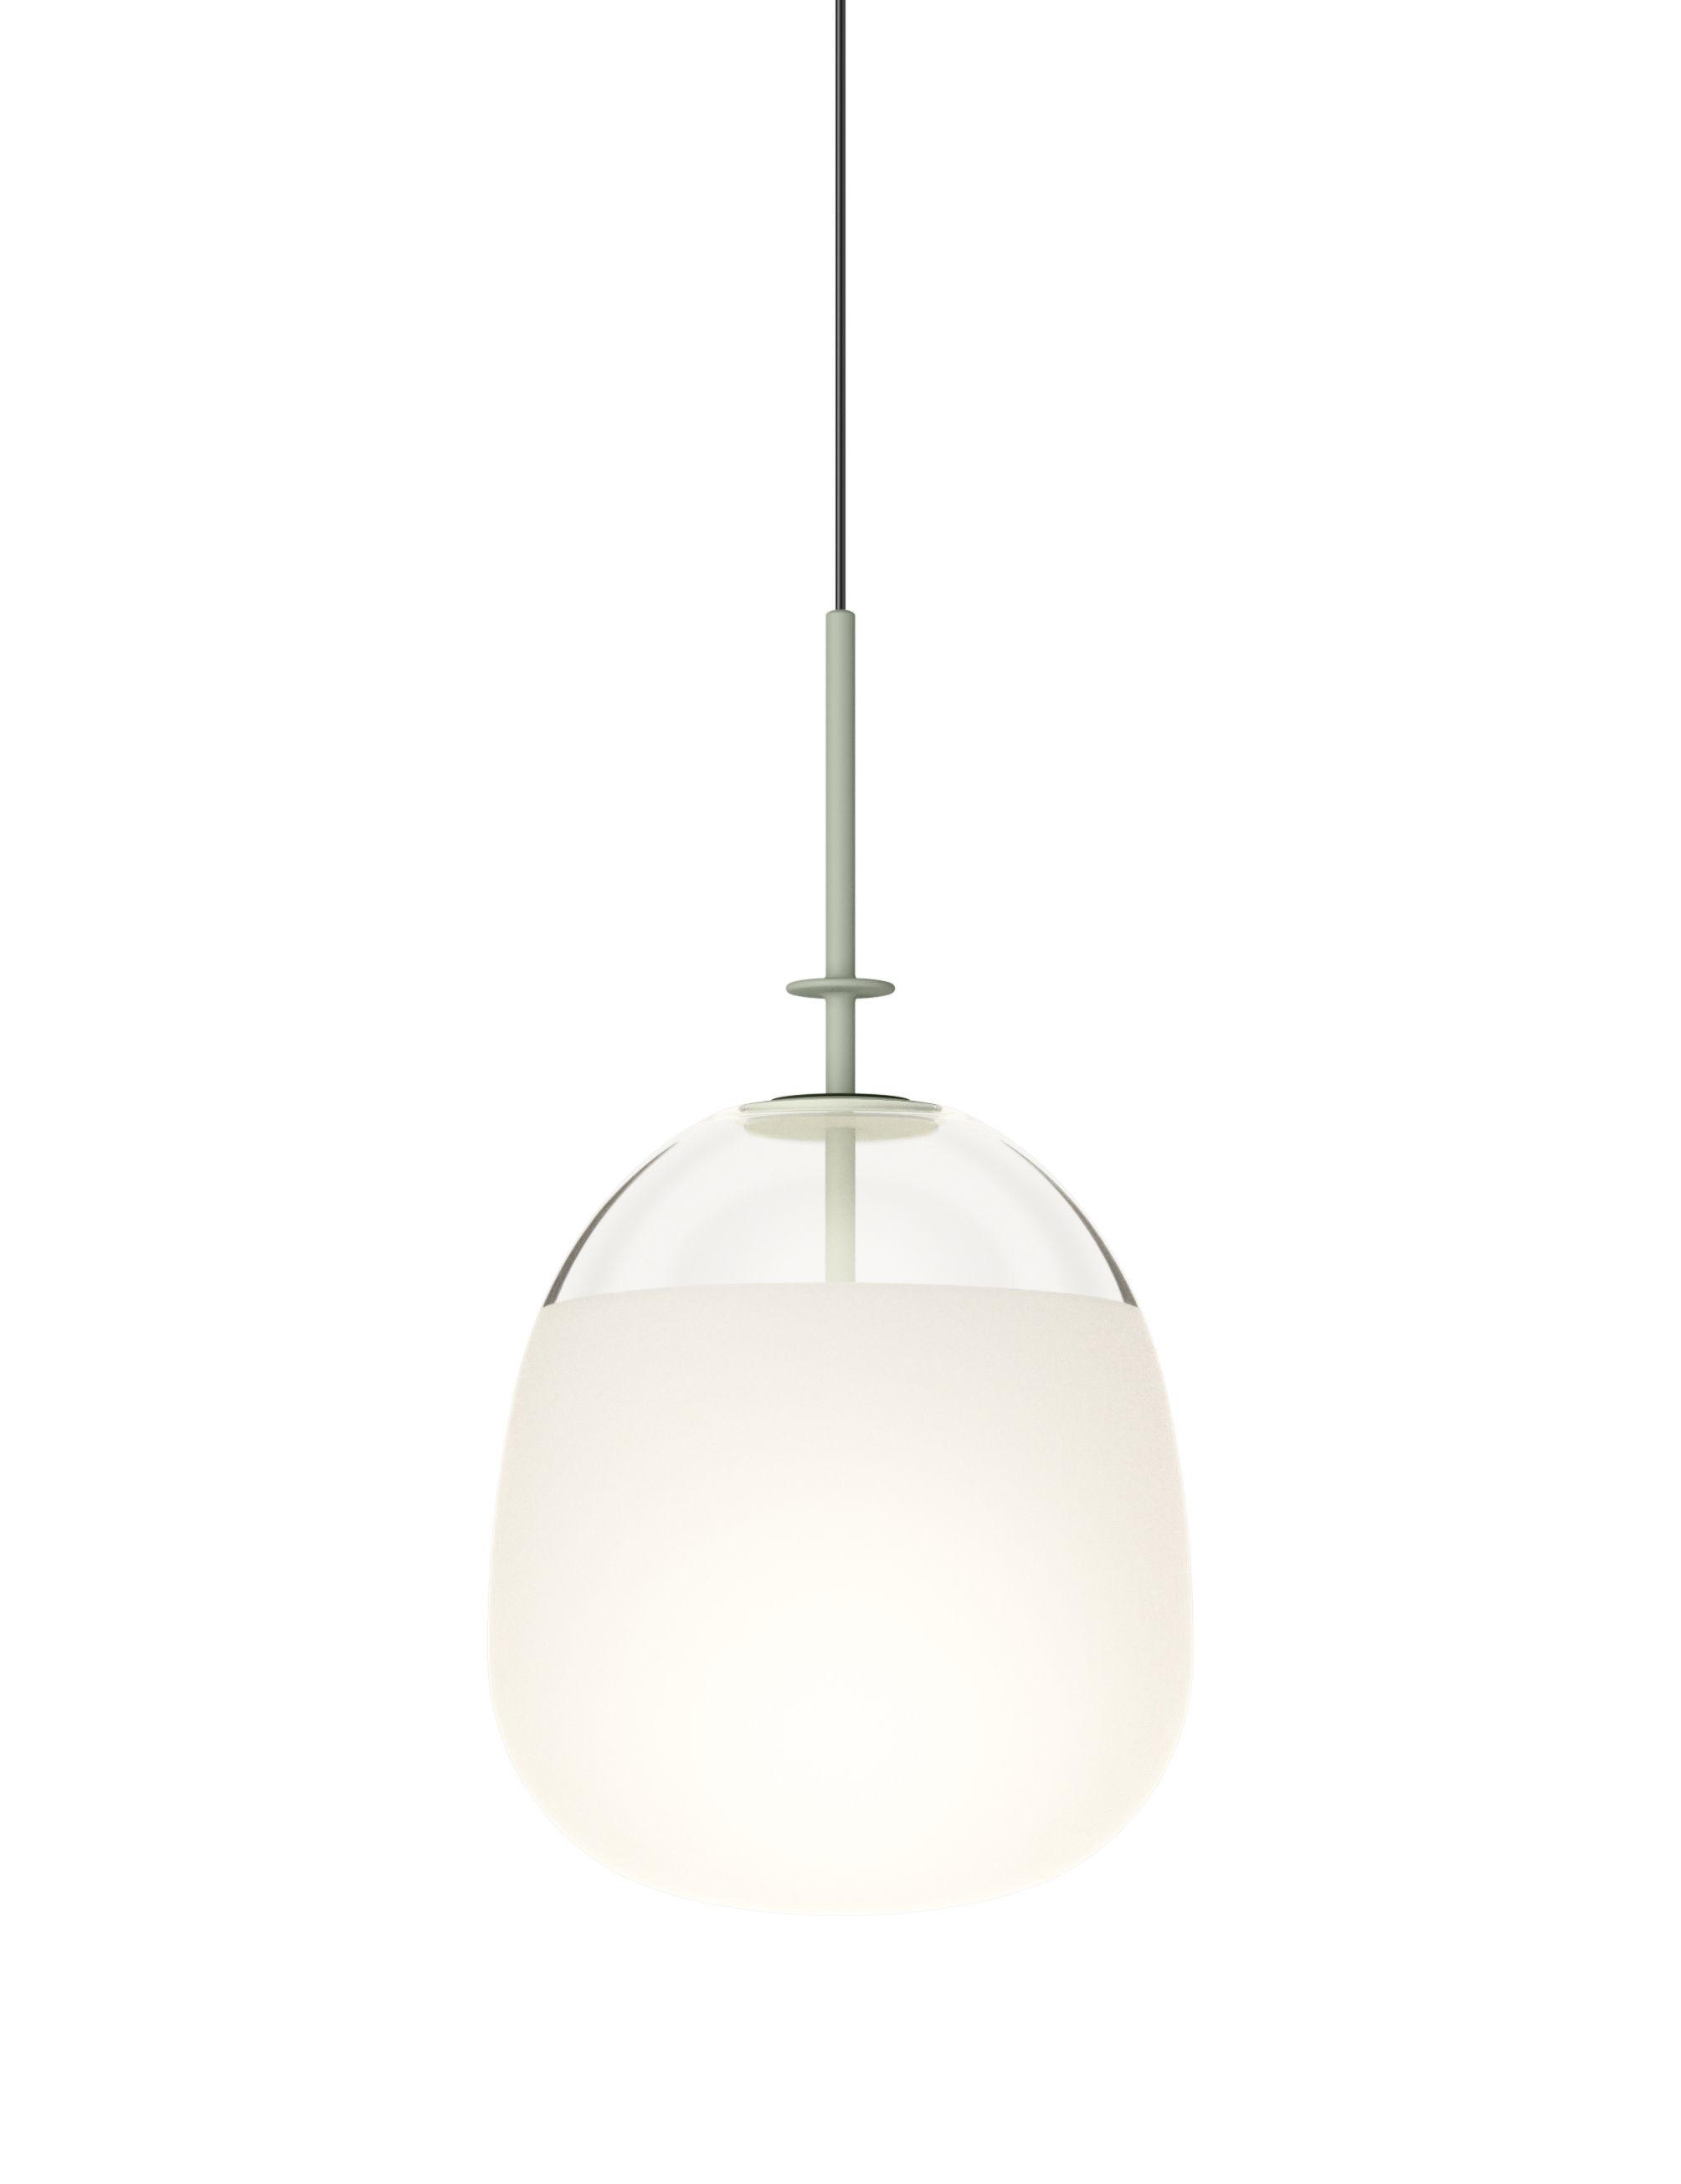 Leuchten - Pendelleuchten - Tempo Globe Pendelleuchte / LED - Ø 24 cm - Vibia - Grün - geblasenes Glas, klarlackbeschichtetes Aluminium